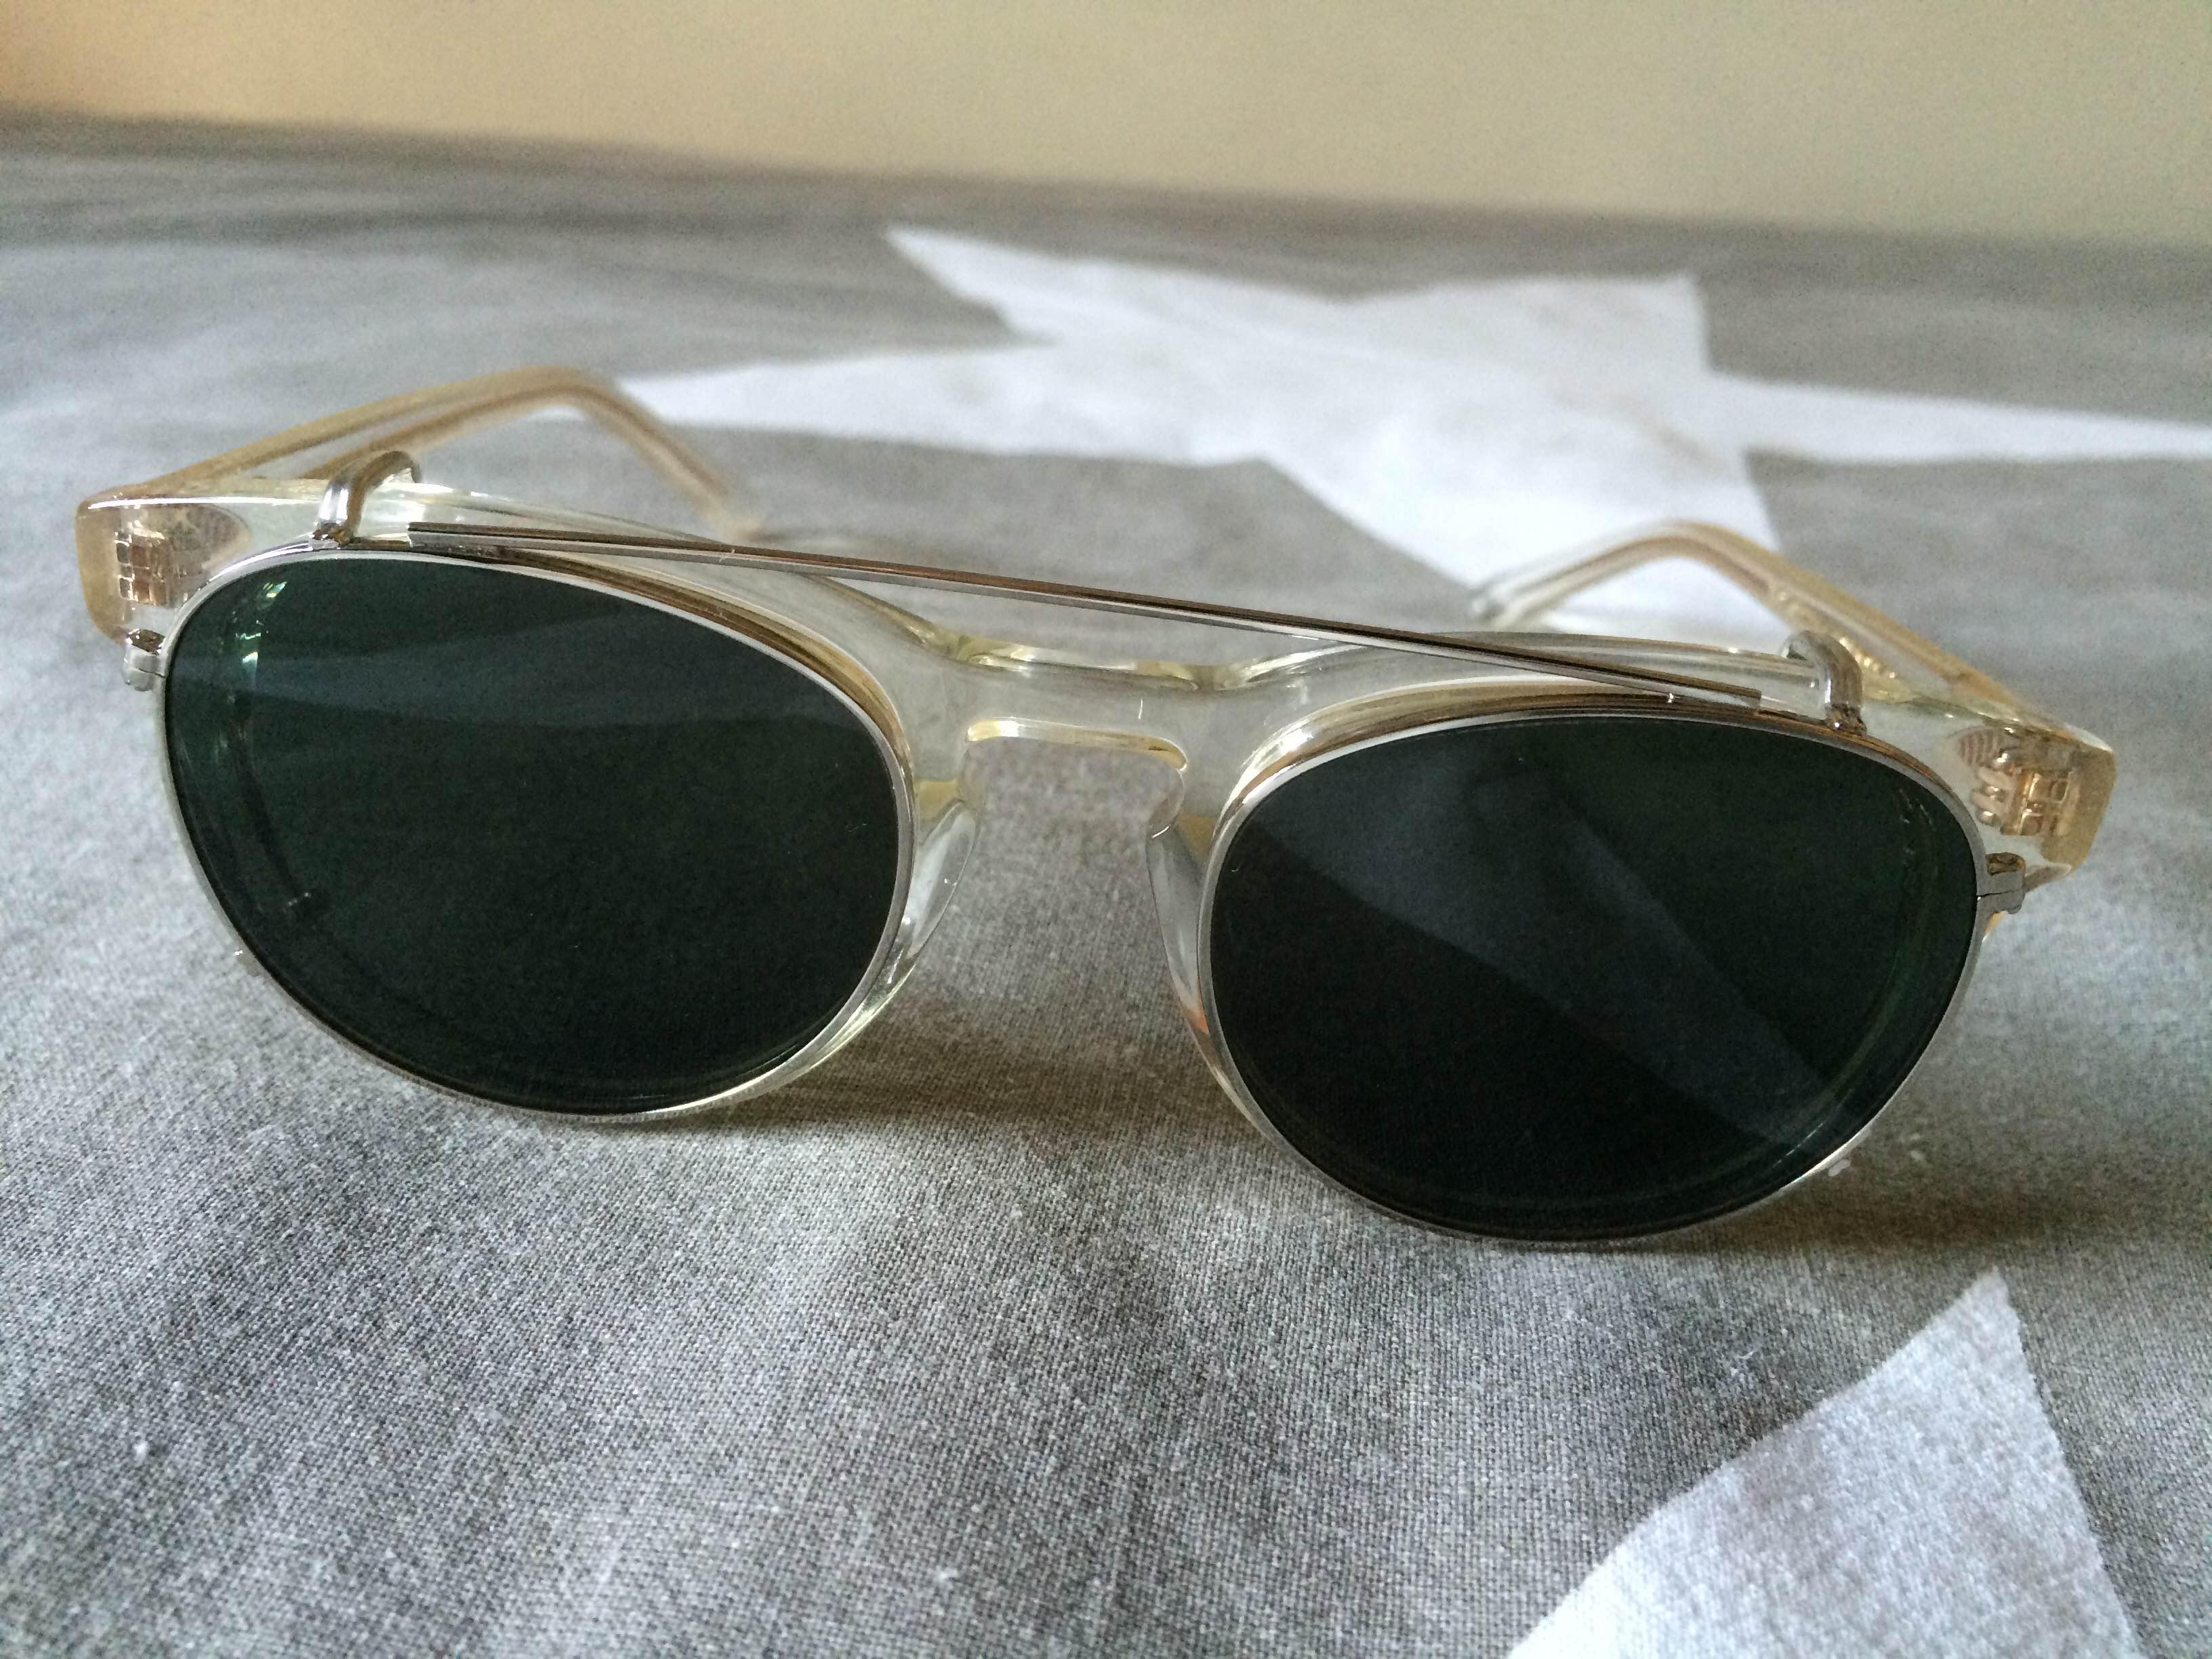 4a67ff956361 Han Kjobenhavn Timeless Champagne Clip-On Sunglasses Size one size ...